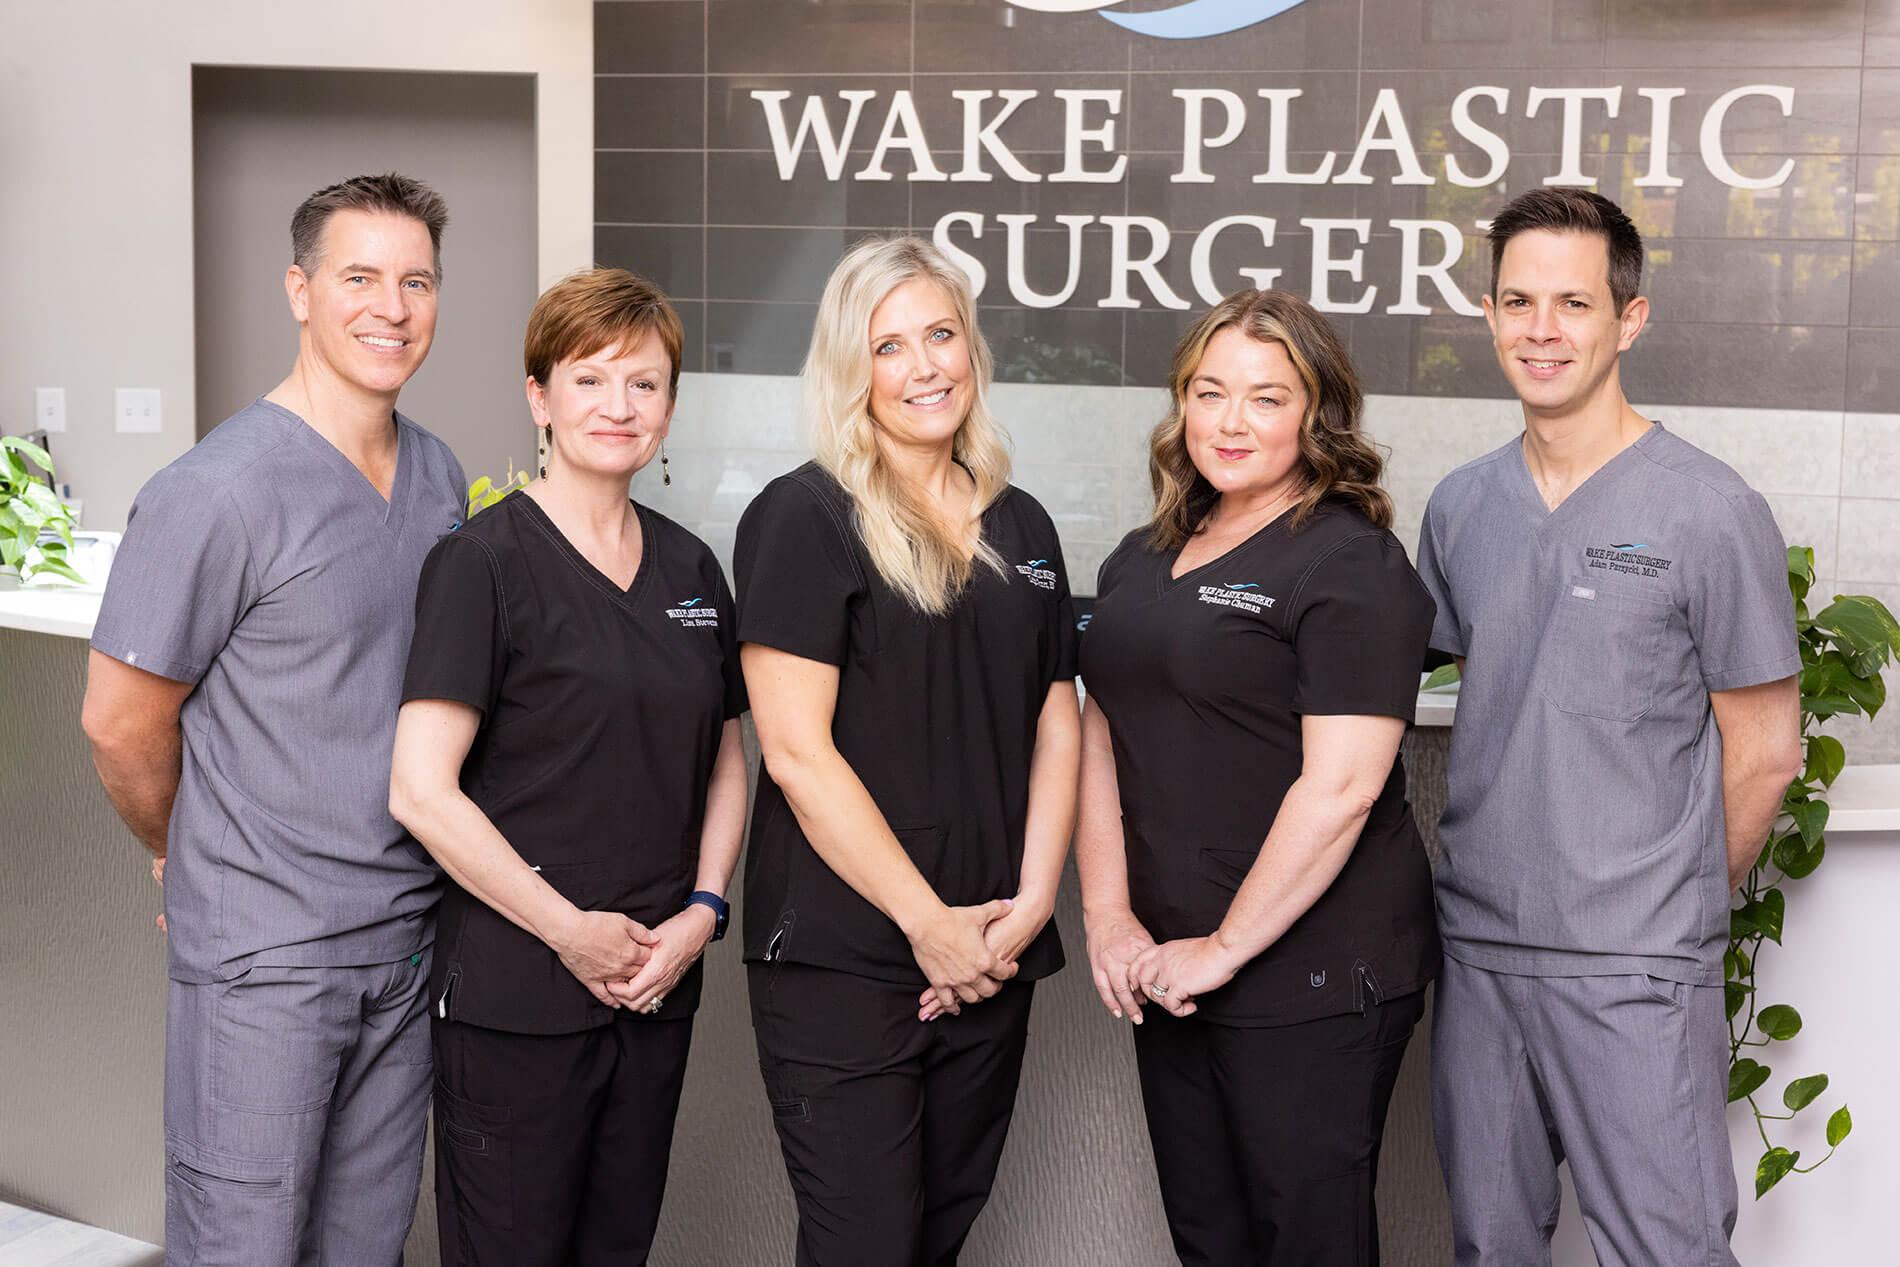 Wake Plastic Surgery, Dr. Stoeckel, Dr. Purzycki and staff